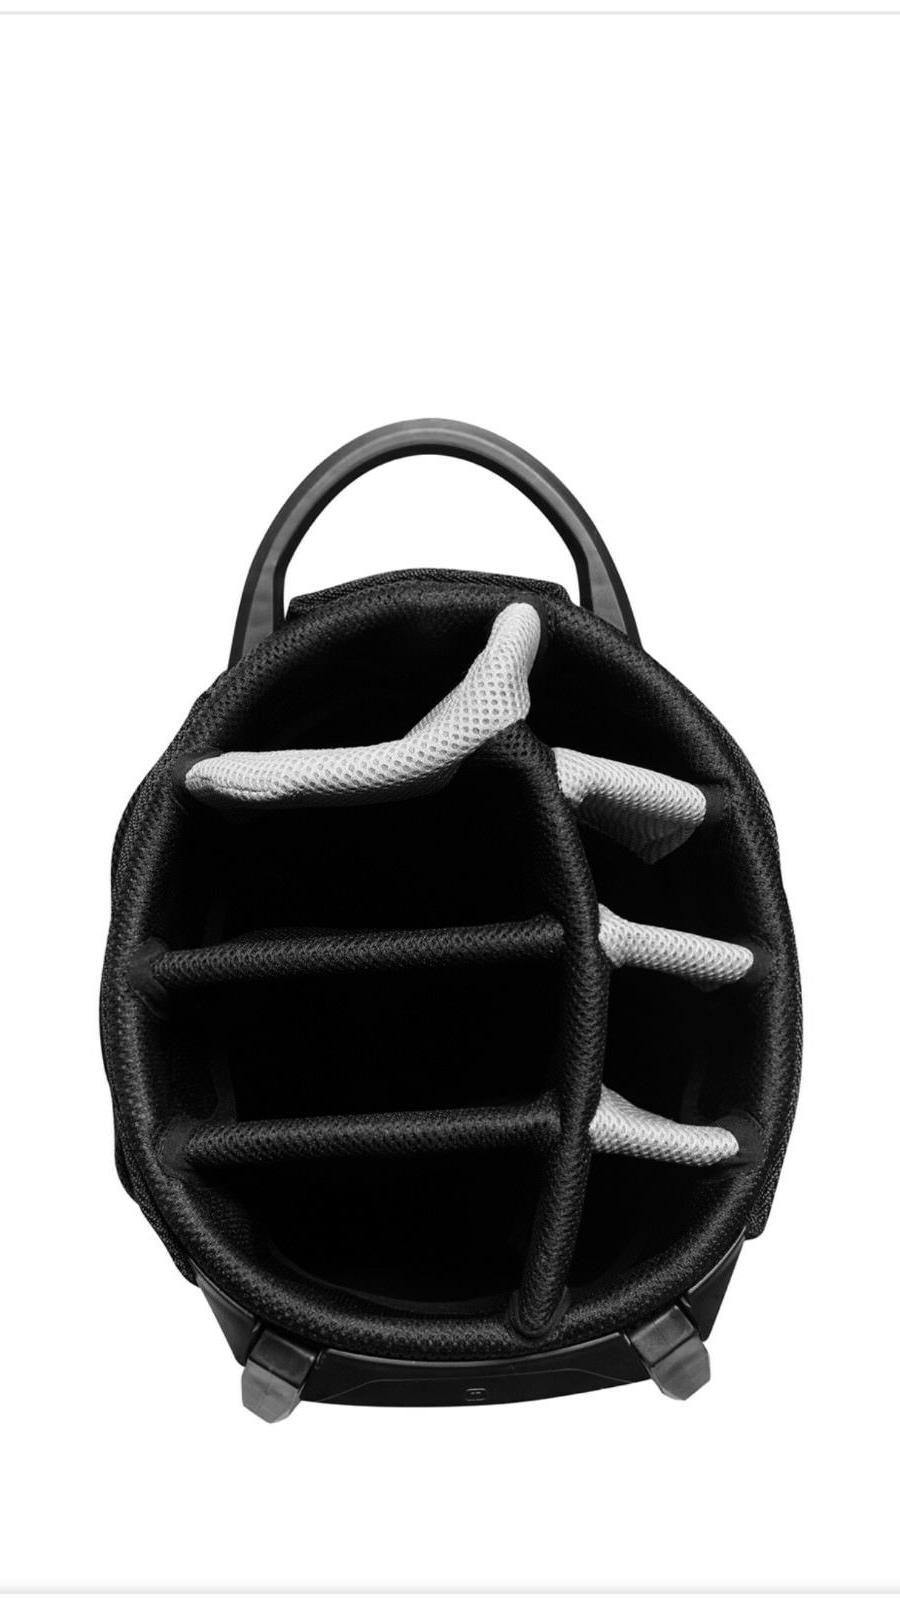 OGIO. ORBIT GOLF Bag black